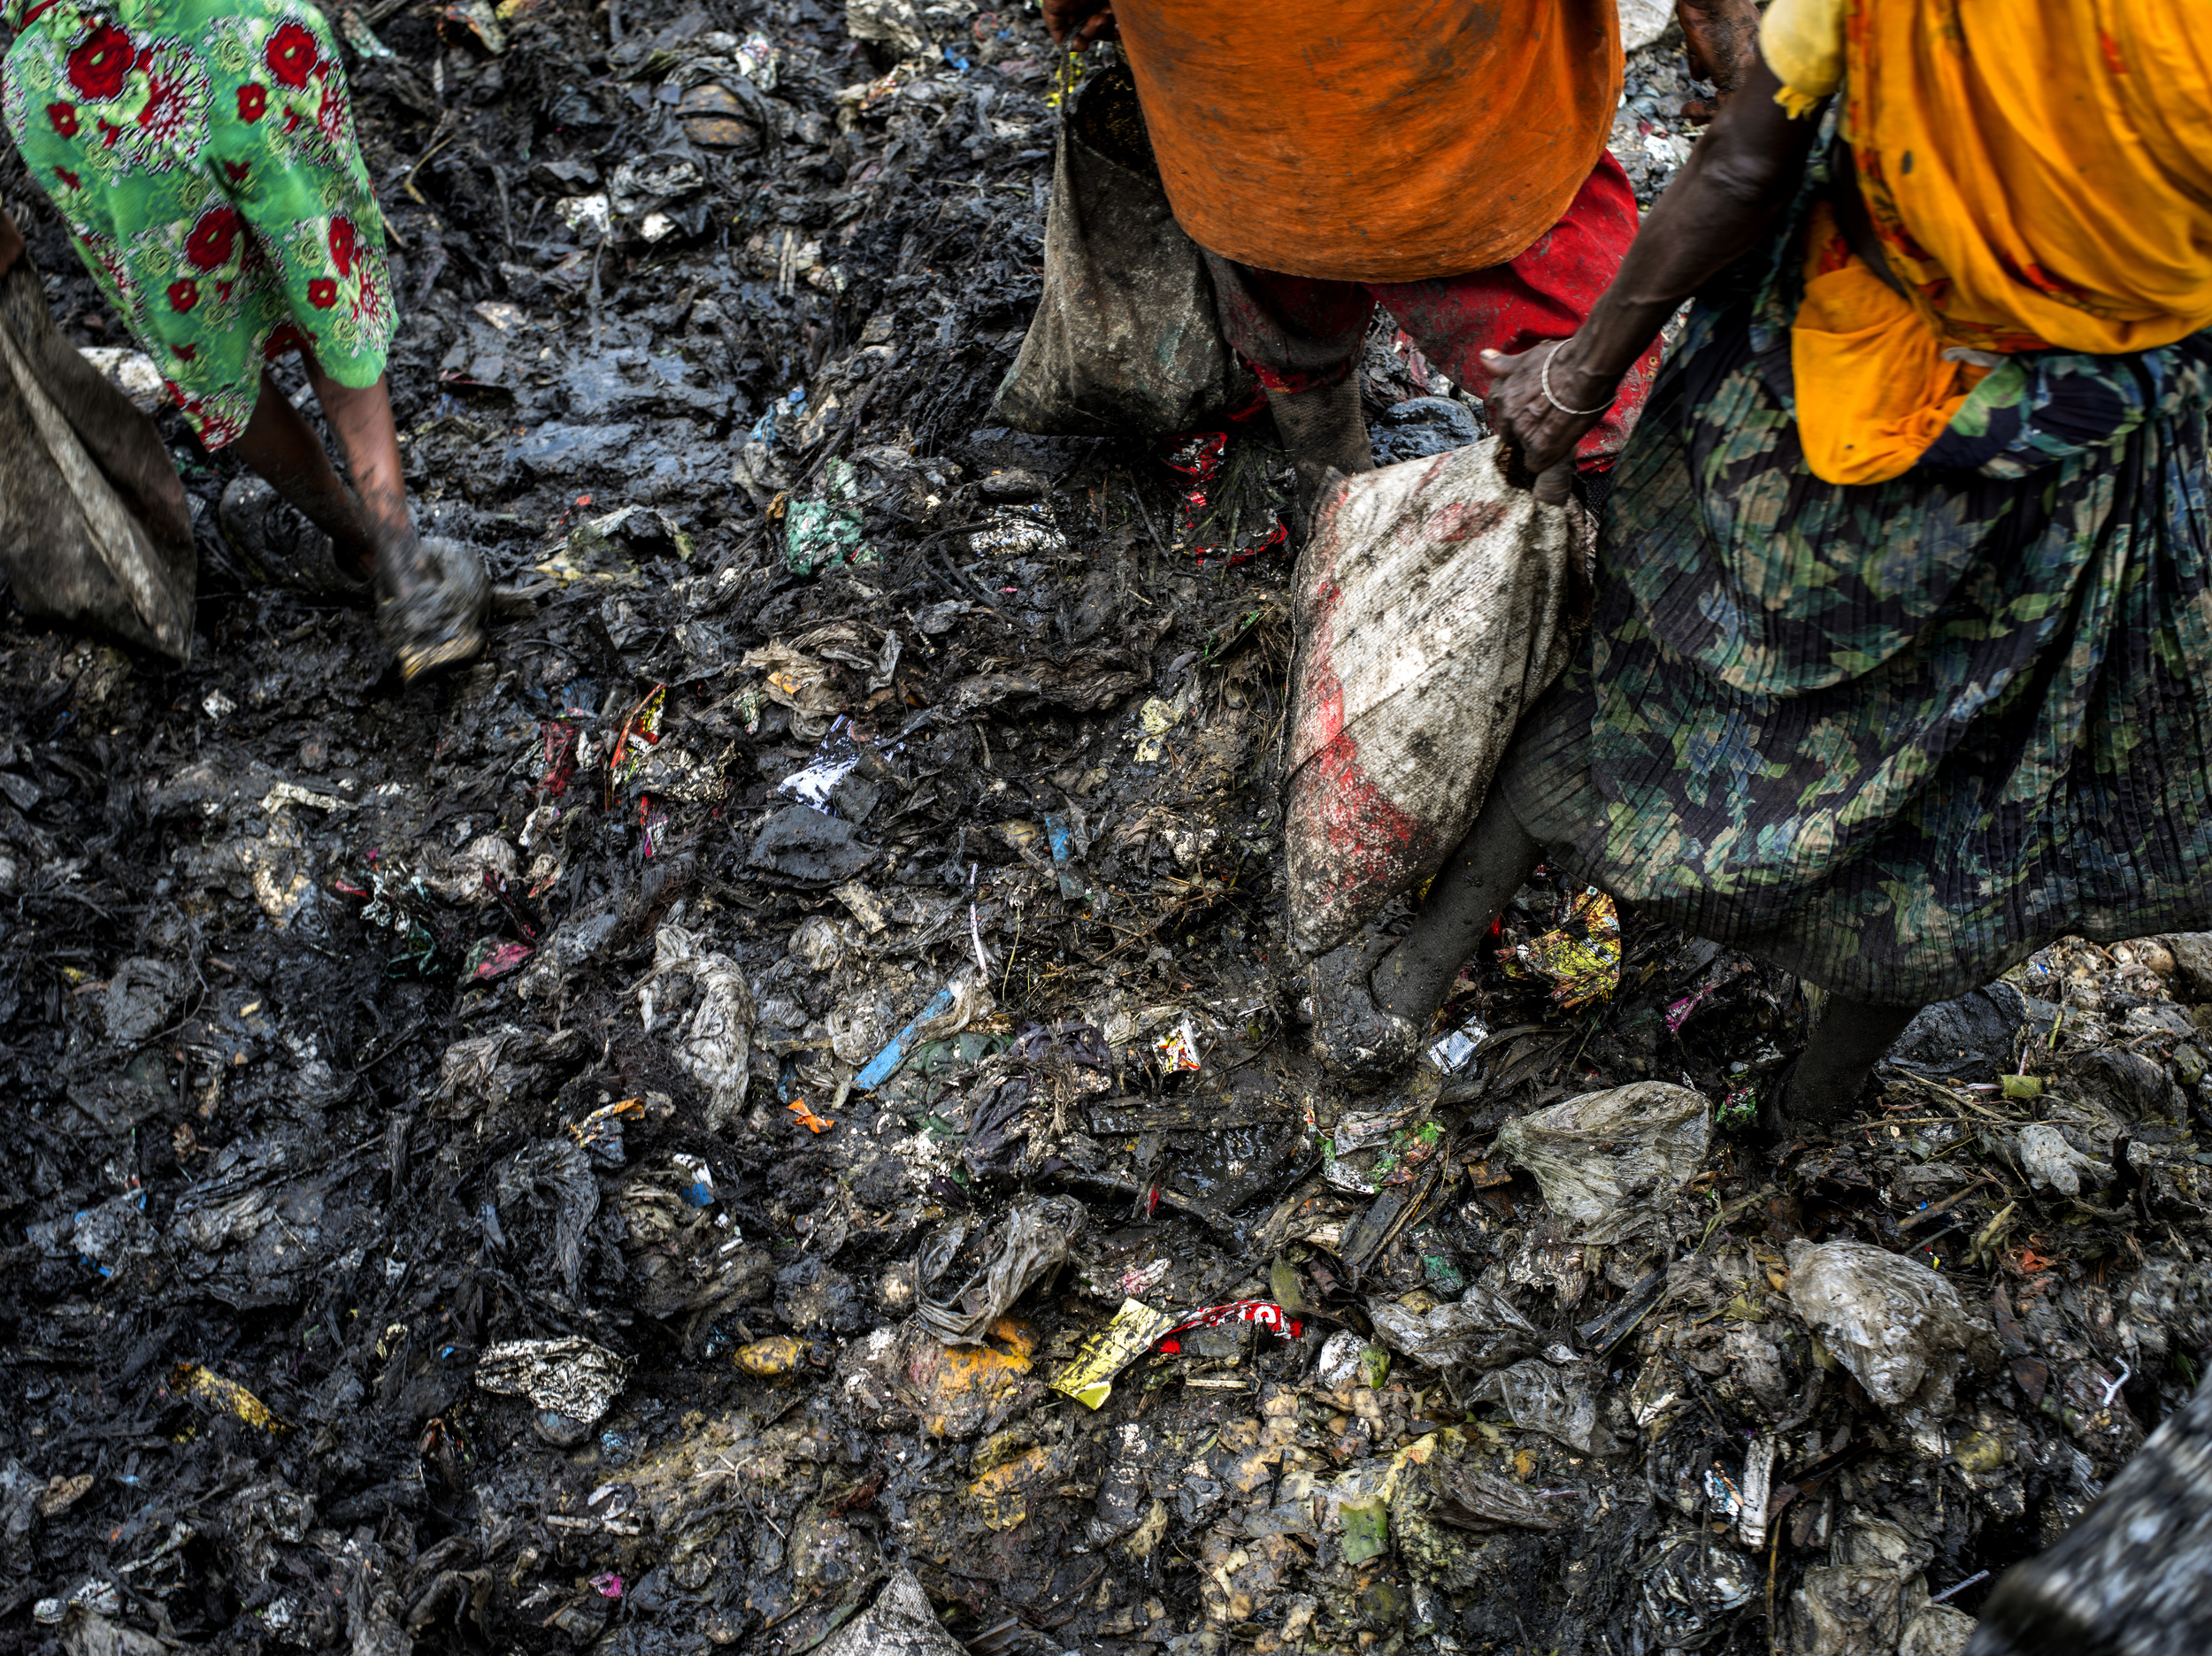 Mutuail Landfill in Dhaka, Bangladesh.